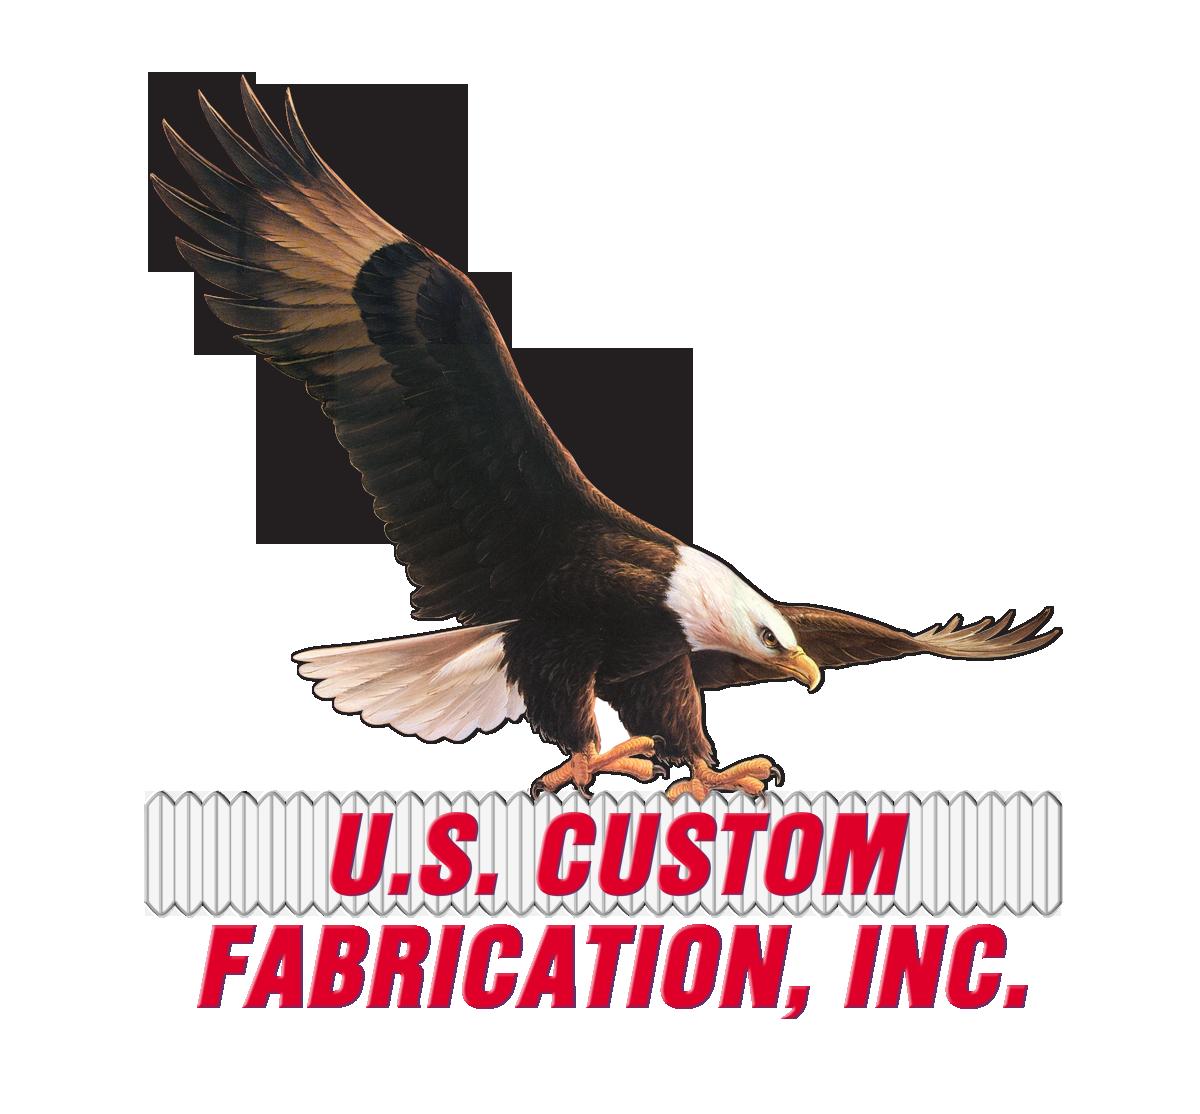 U. S. CUSTOM FABRICATION, INC.